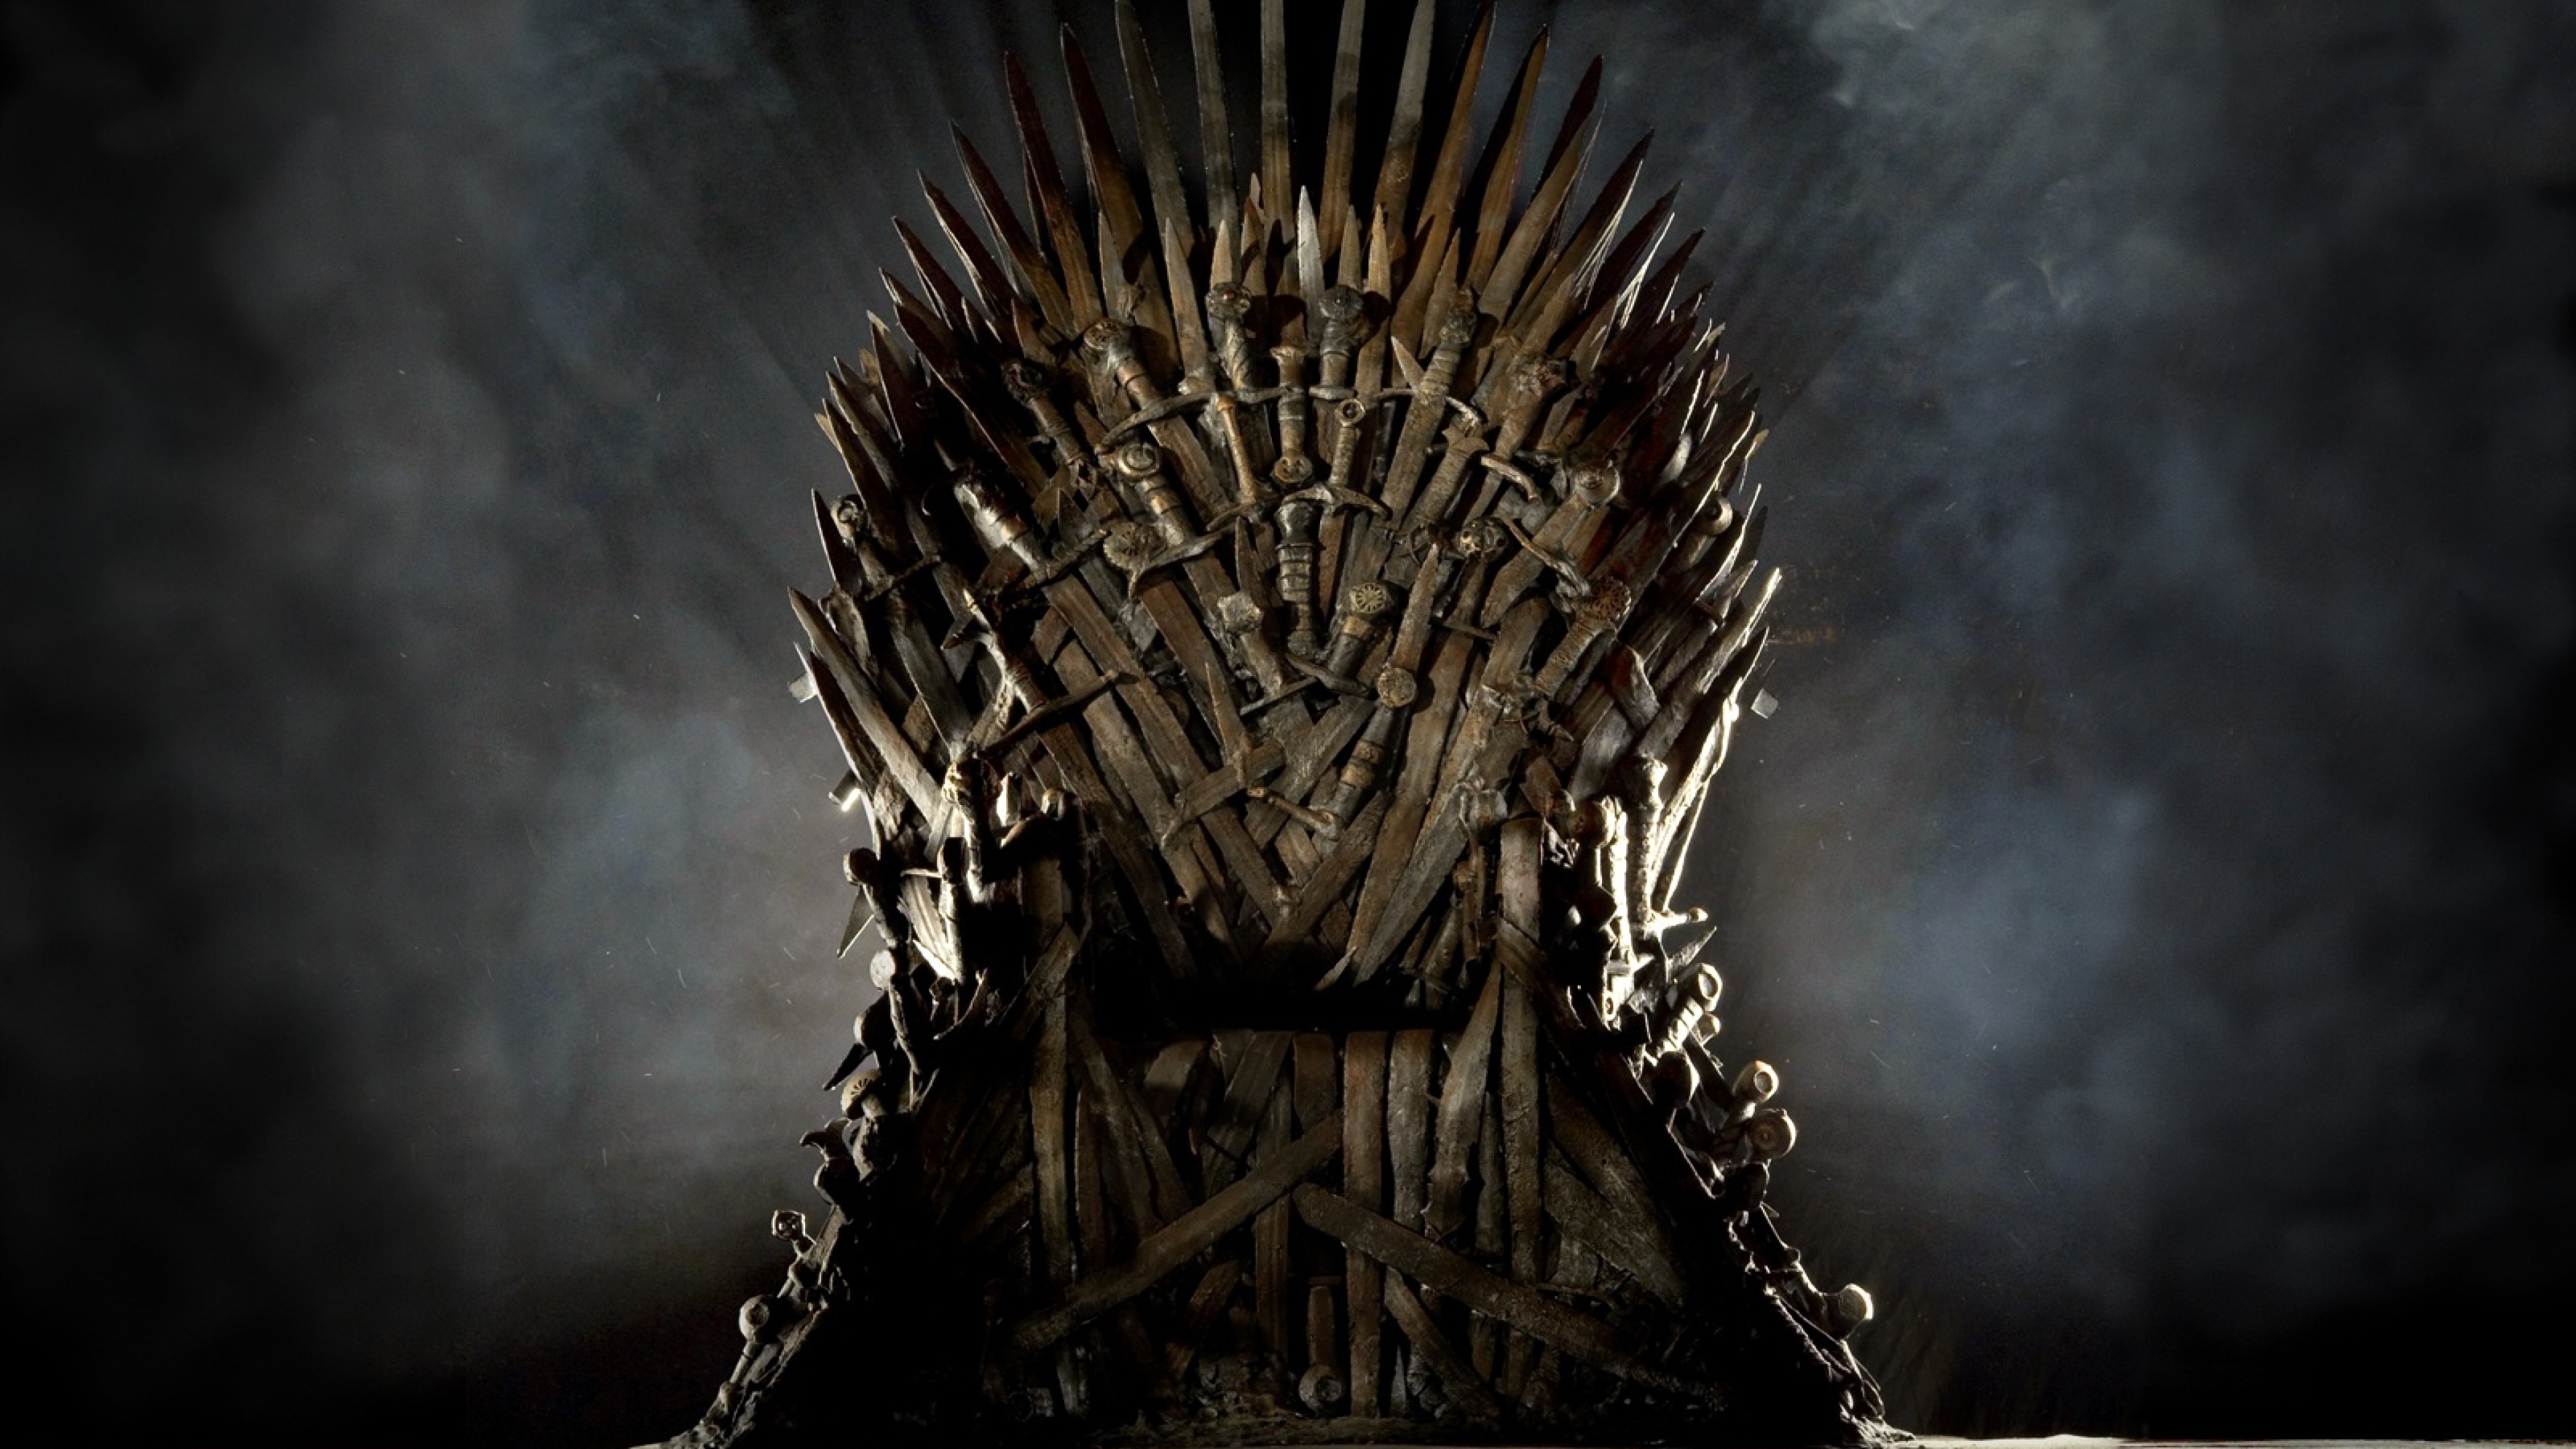 46 4k Game Of Thrones Wallpaper On Wallpapersafari